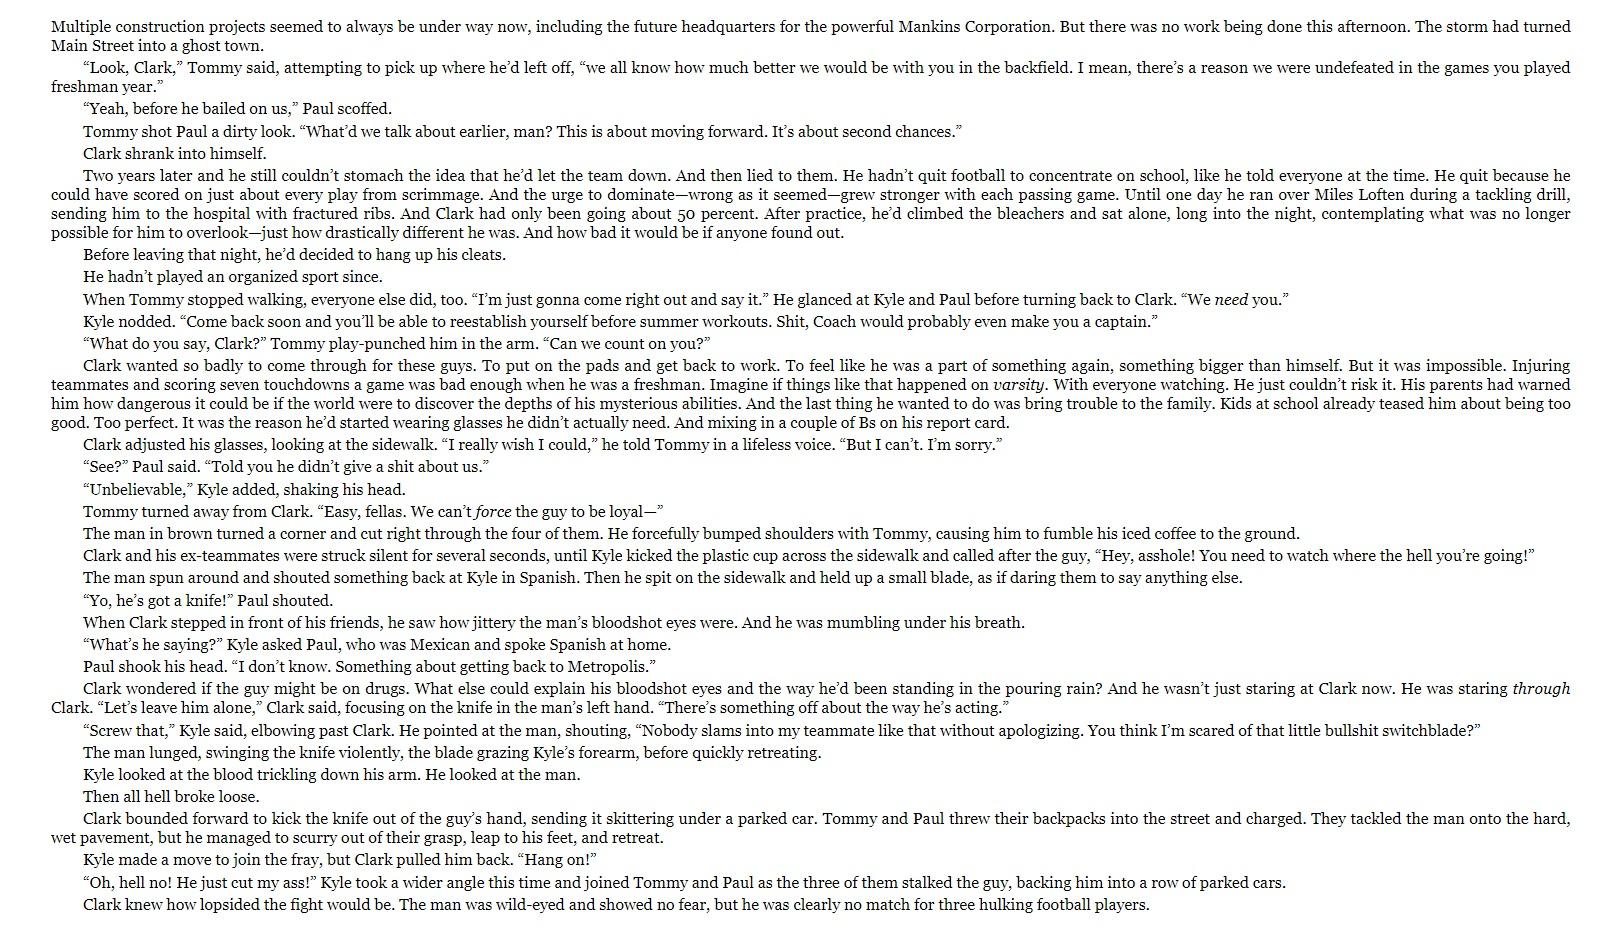 Superman Dawnbreaker sample page 2